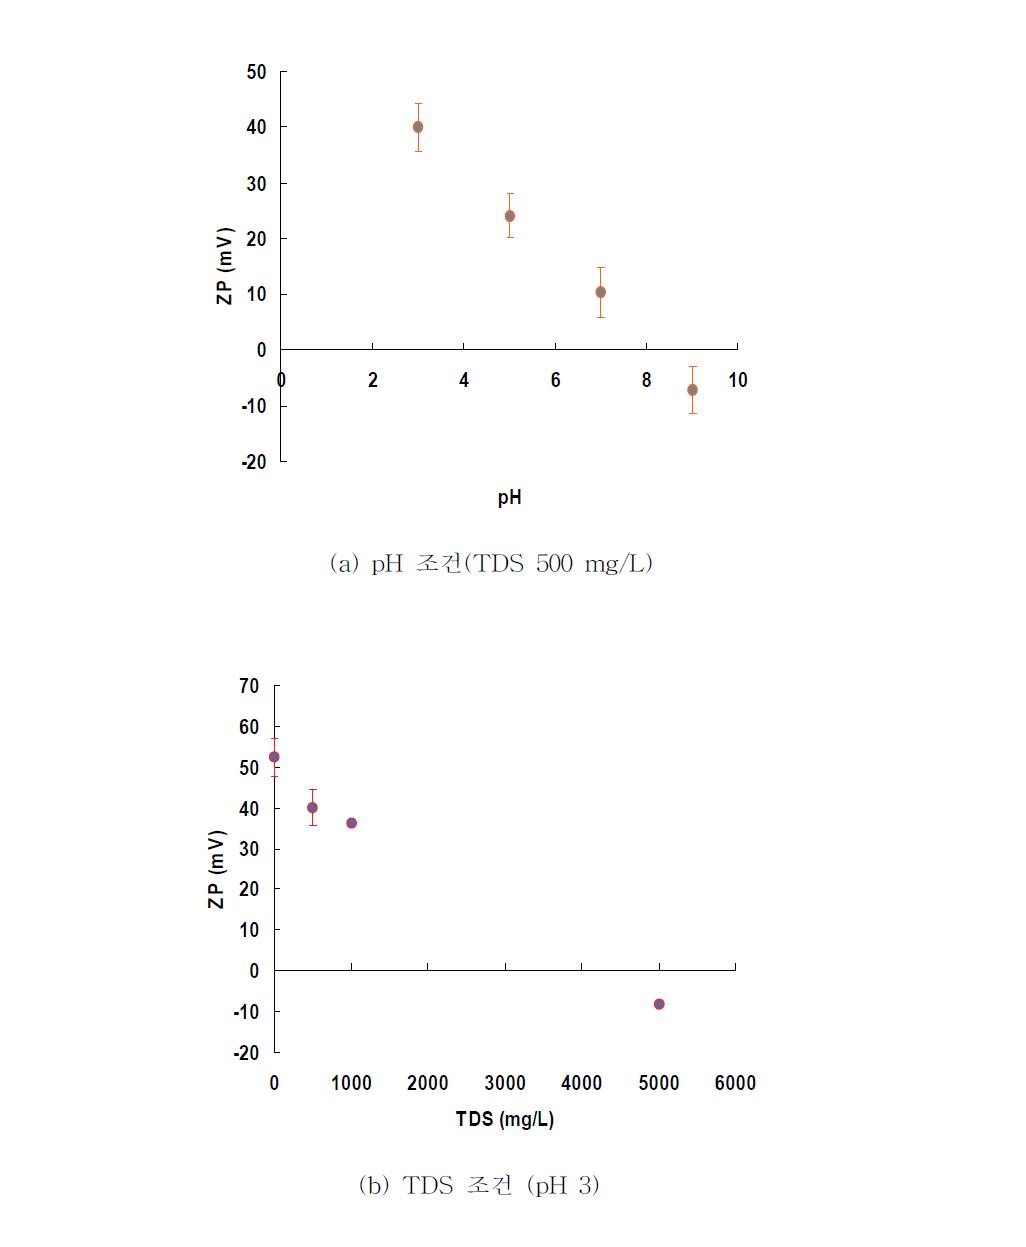 TiO2 광촉매의 표면전하(zeta potential) 측정